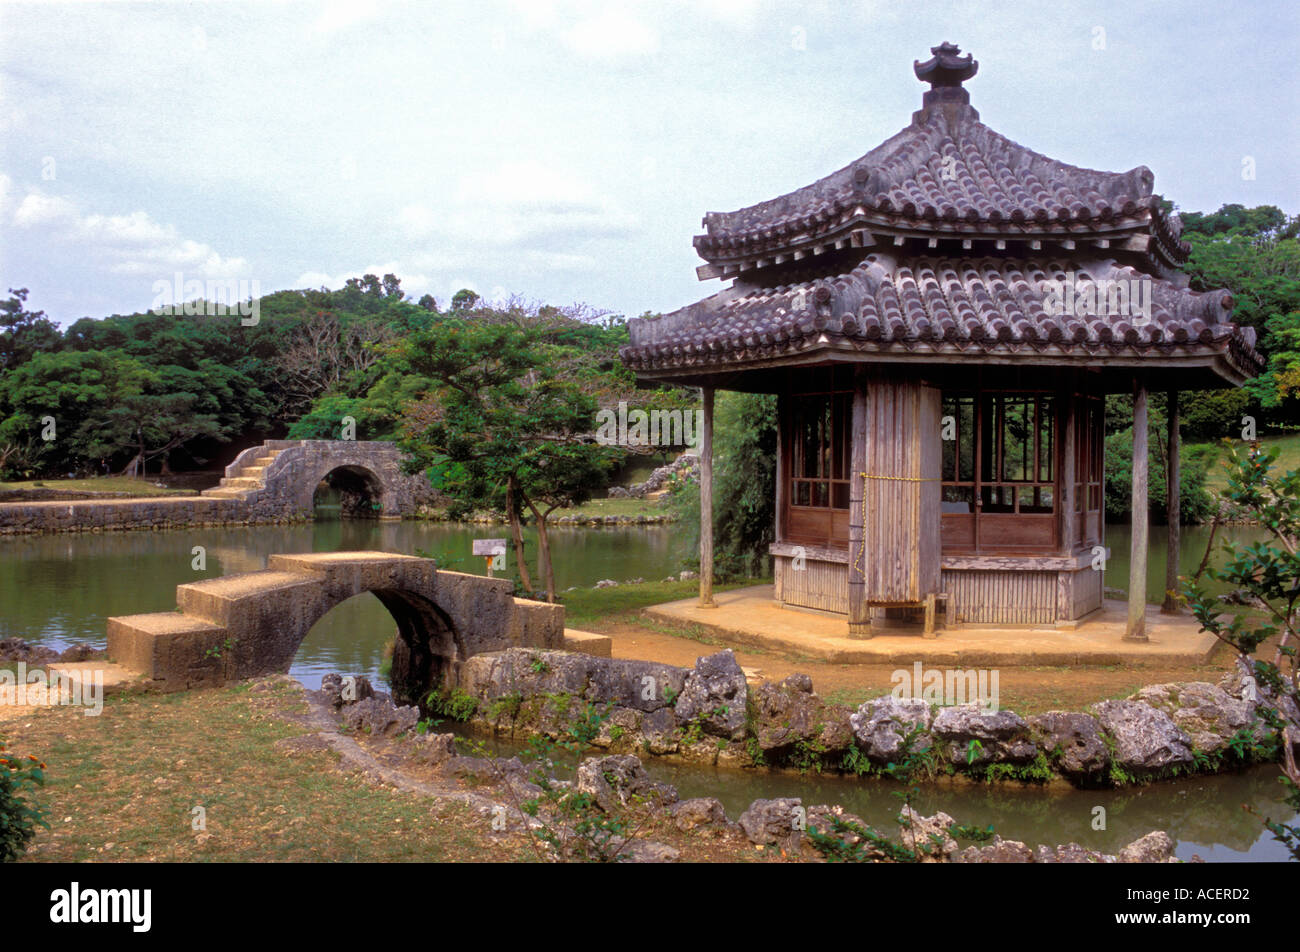 Hexagonal Pagoda With Stone Bridges In Shikinaen Garden In Okinawa